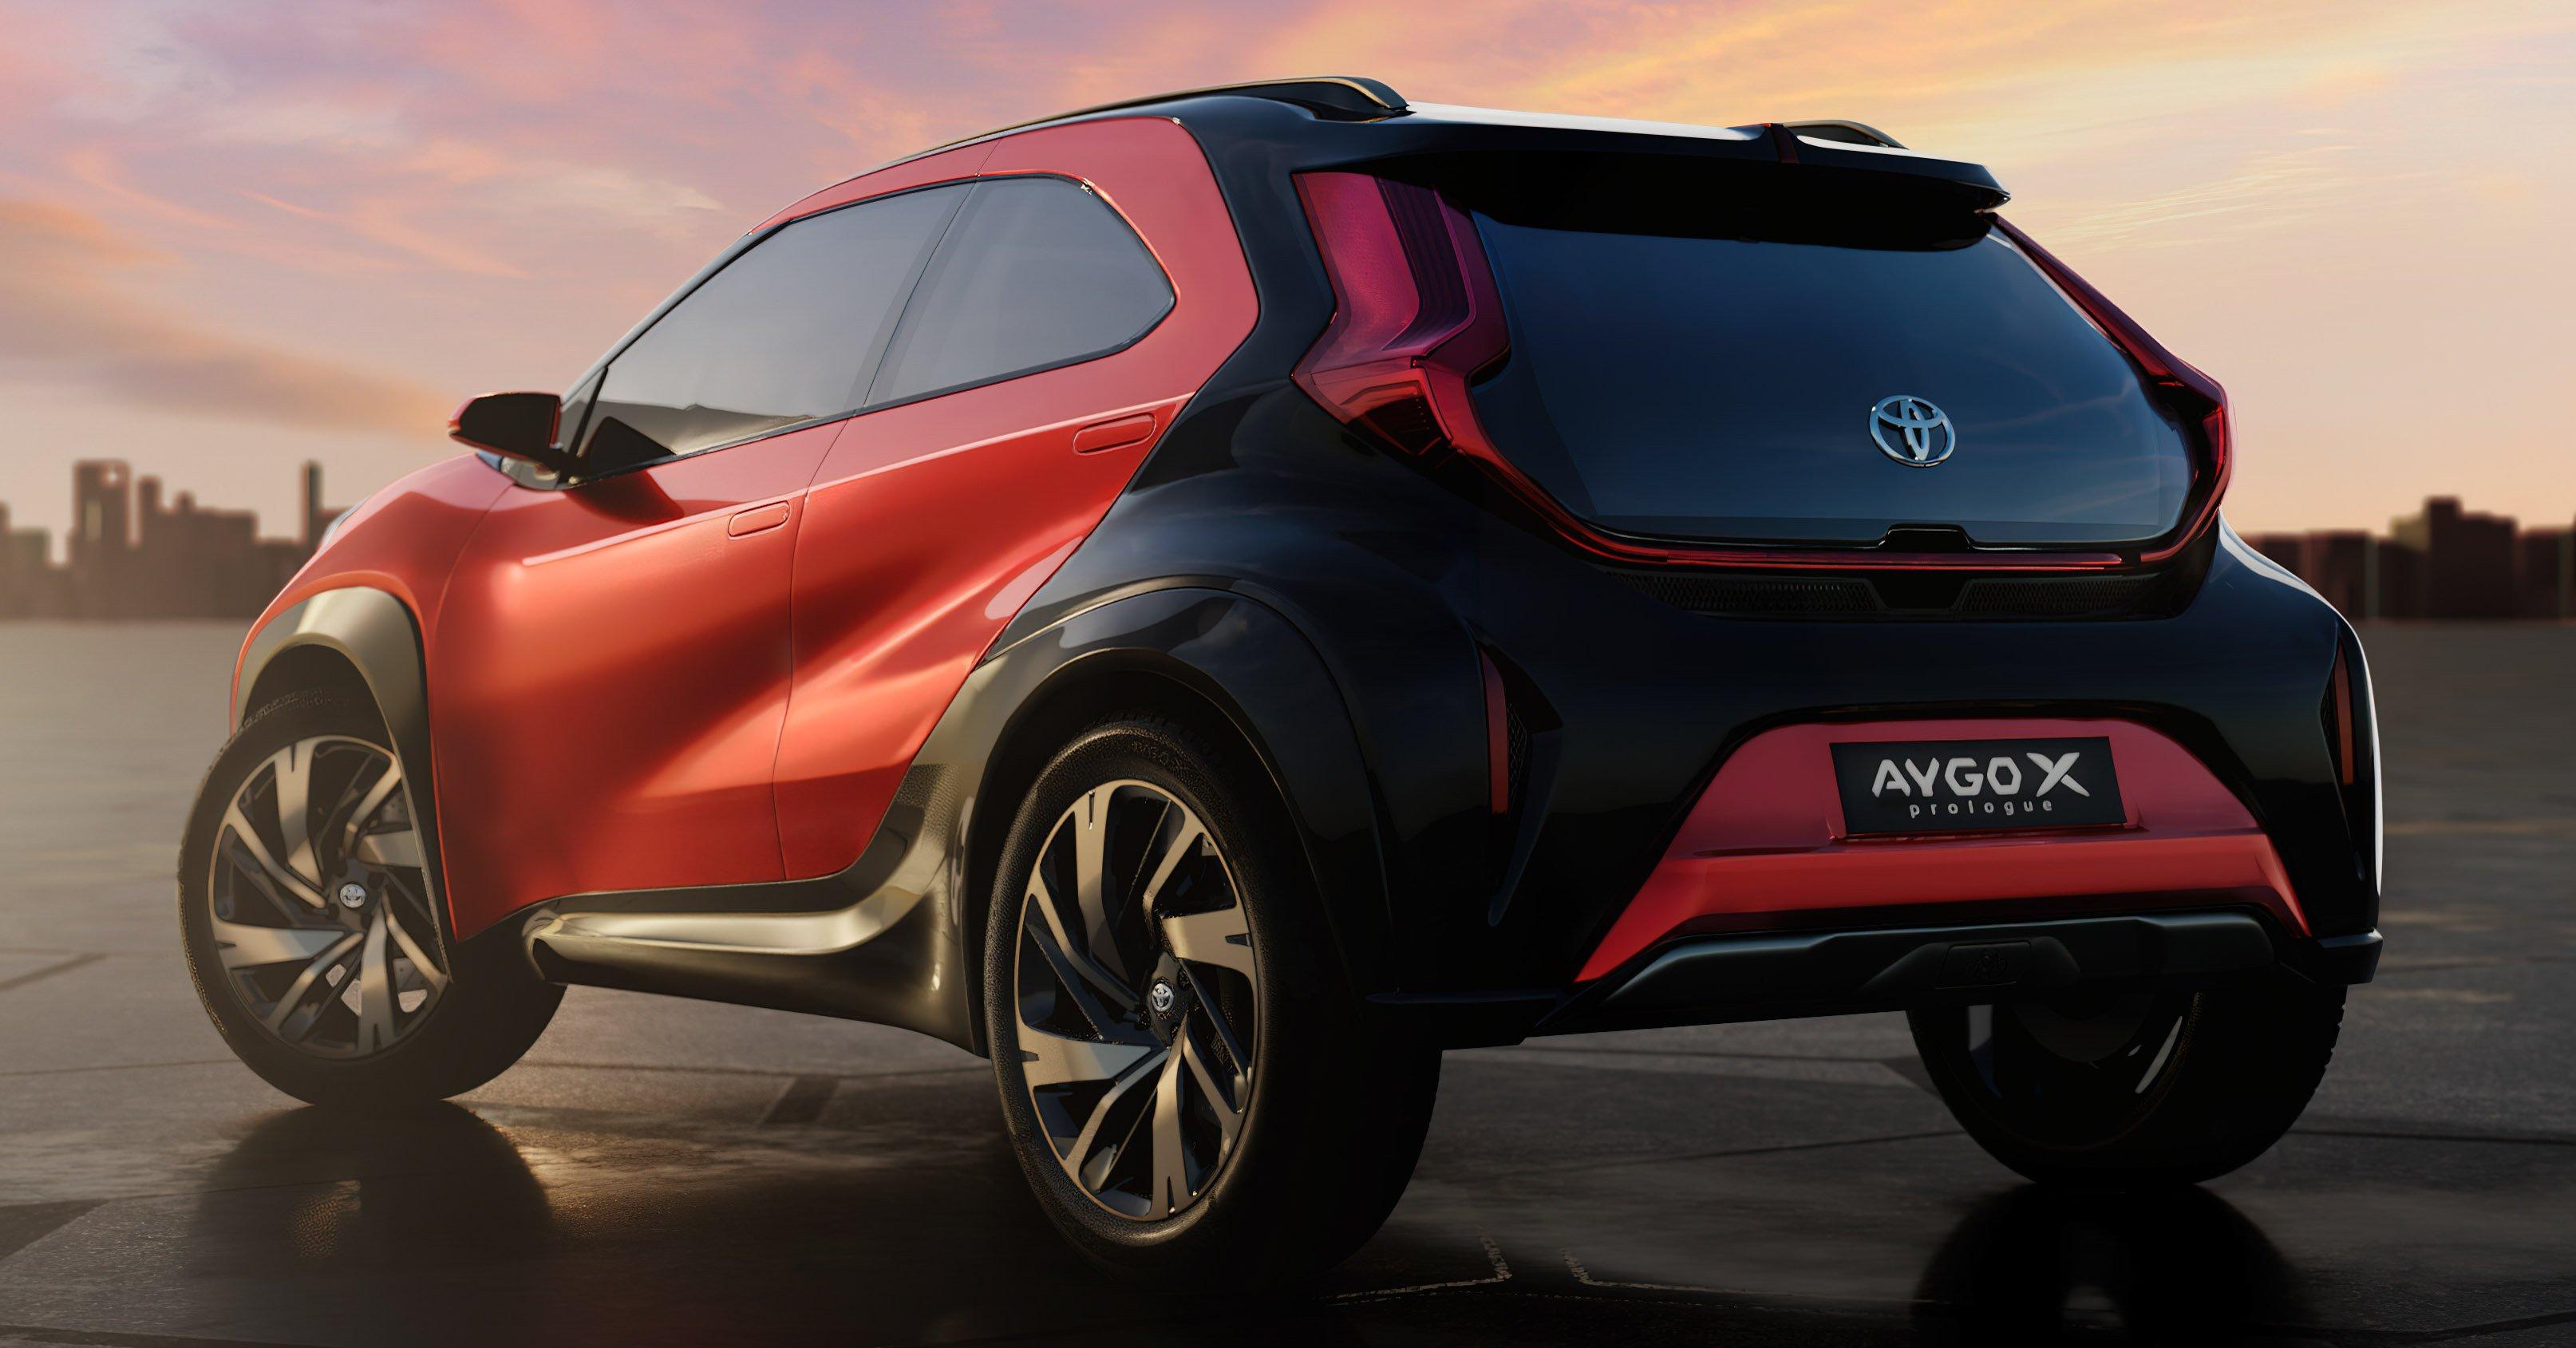 Koncept Toyota Aygo X Prologue debutuje - 6